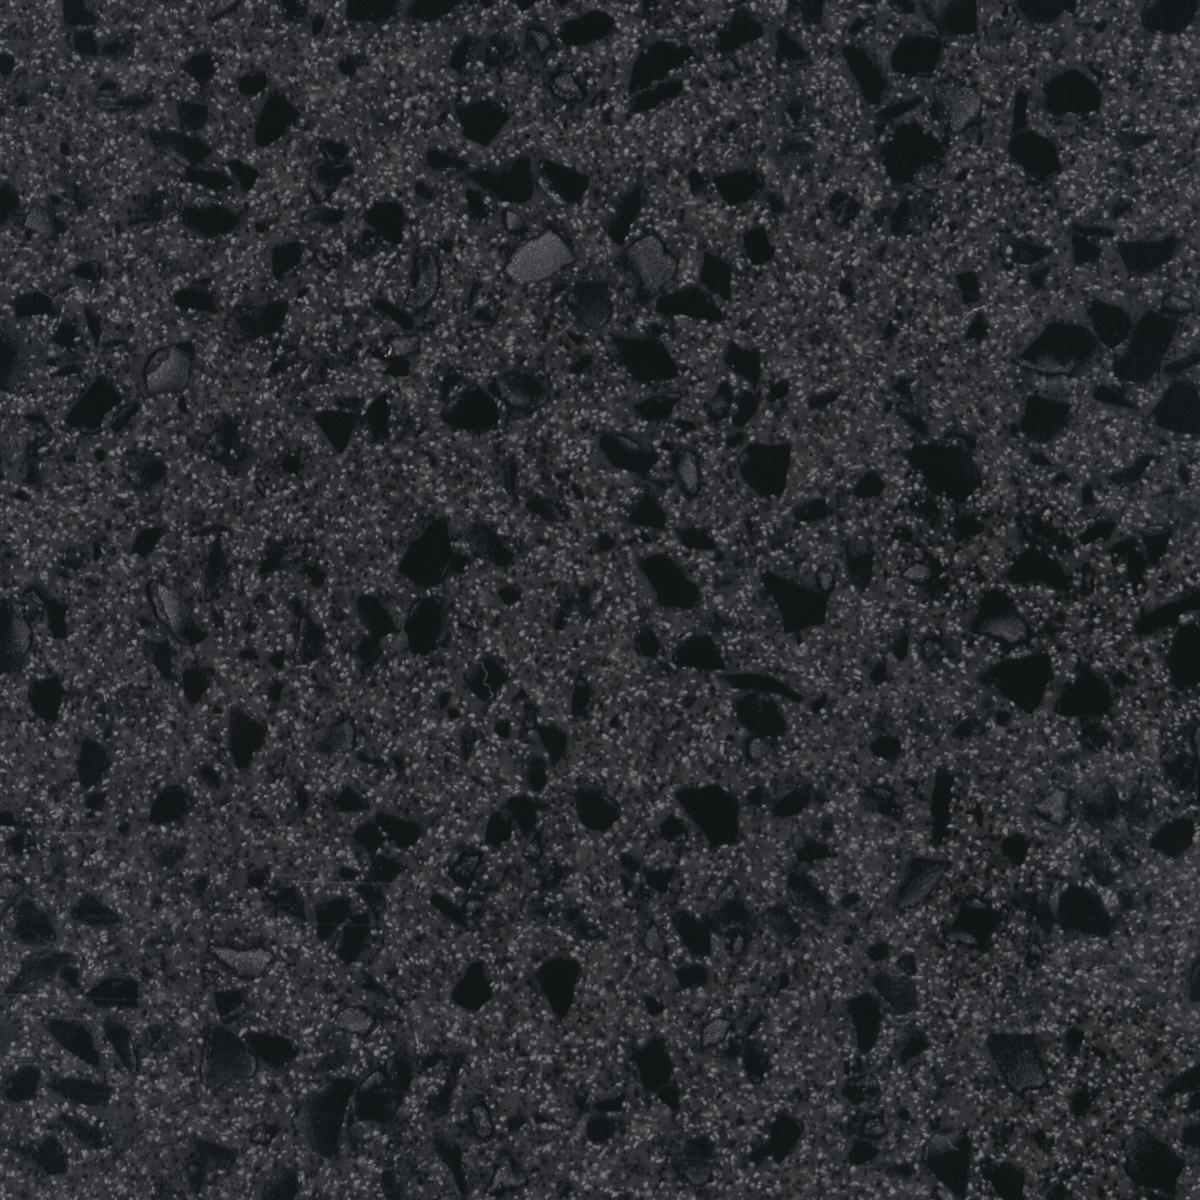 501 Black Lava Laminate Countertops